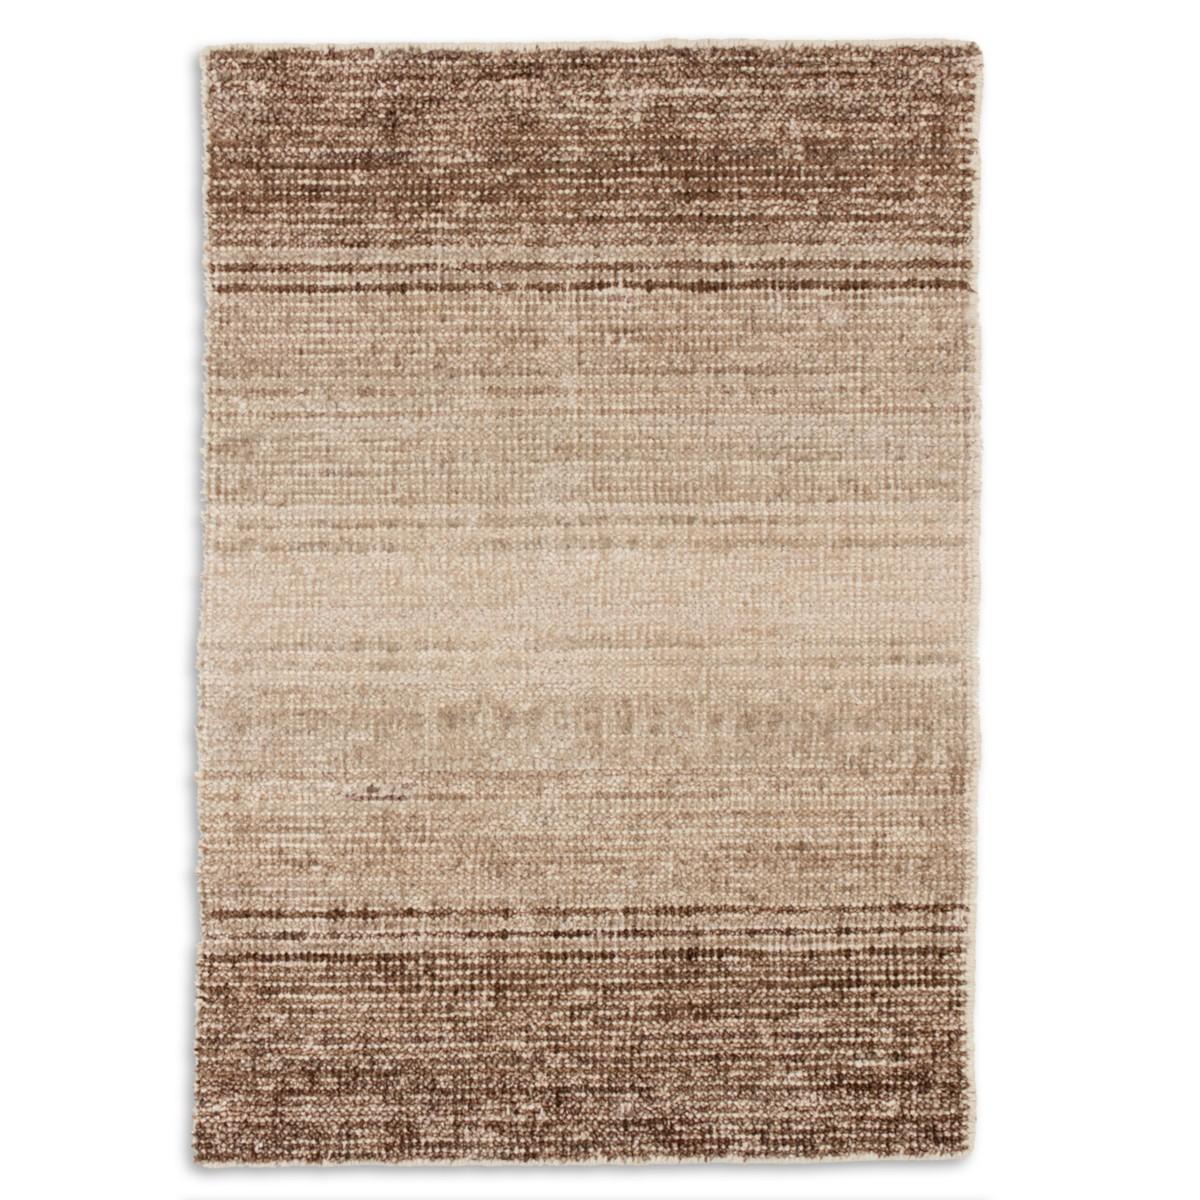 Moon Cotton Viscose Woven Rug - Sand